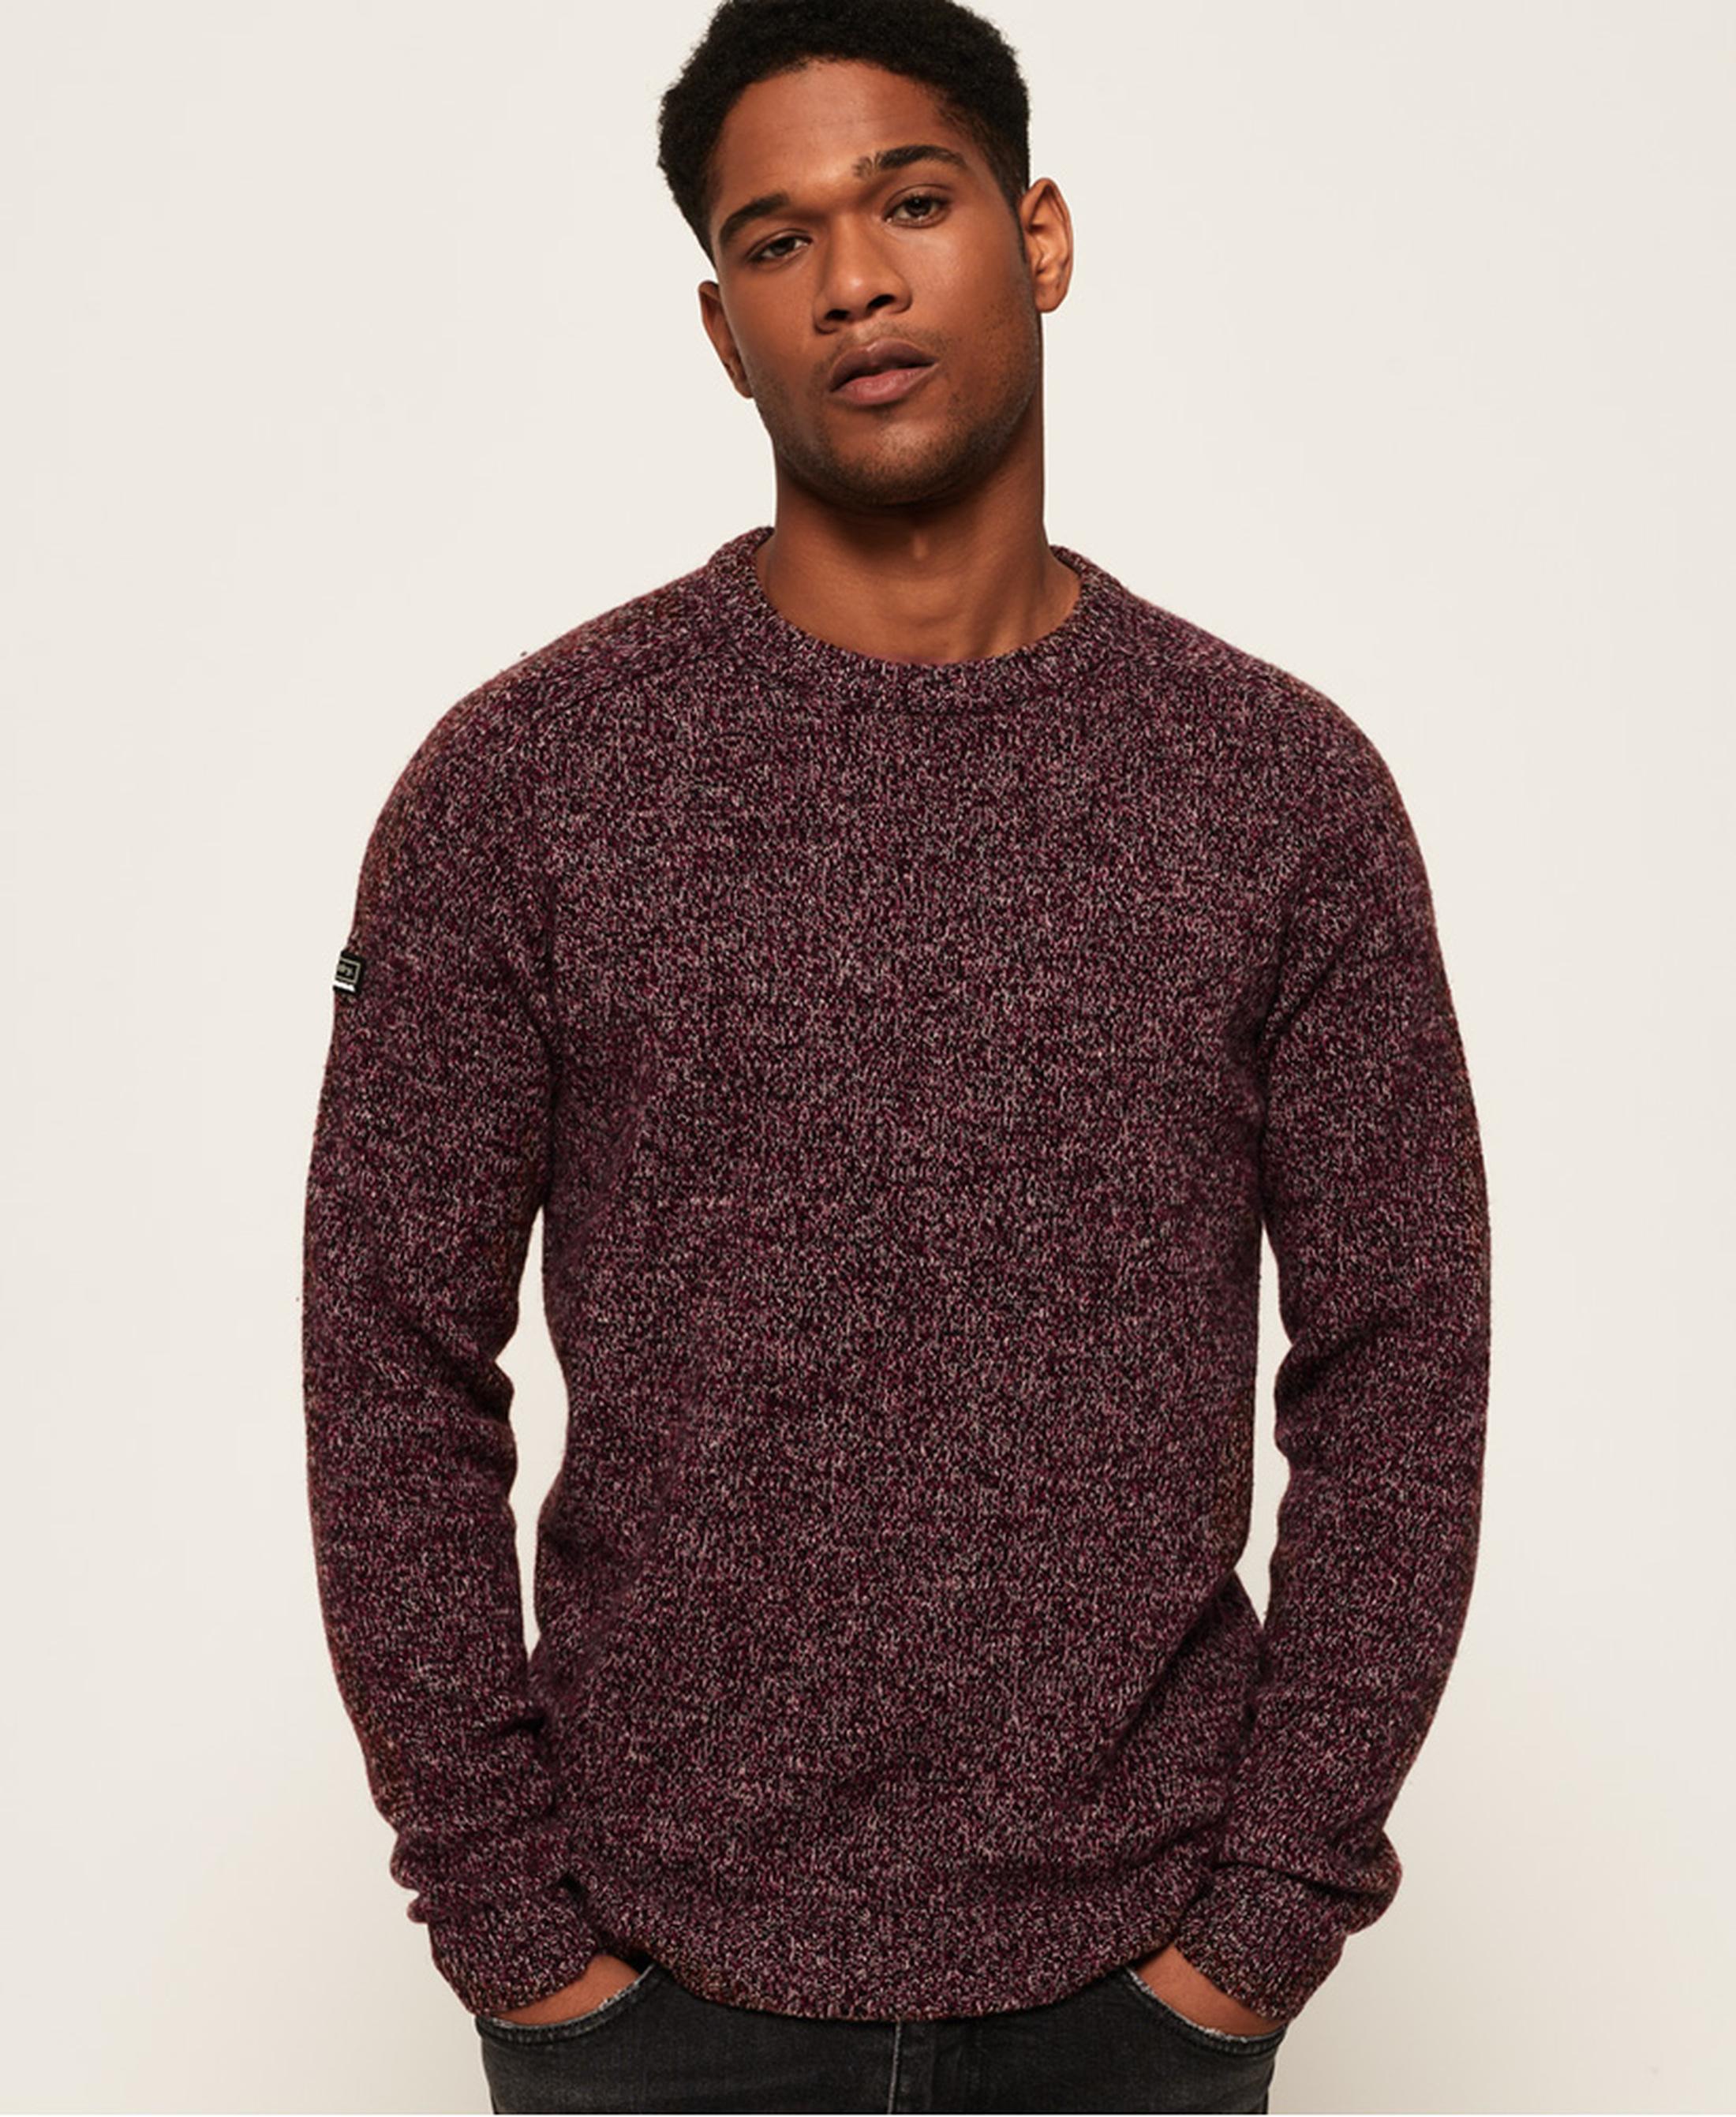 Superdry Sweater Wol Bordeaux foto 1